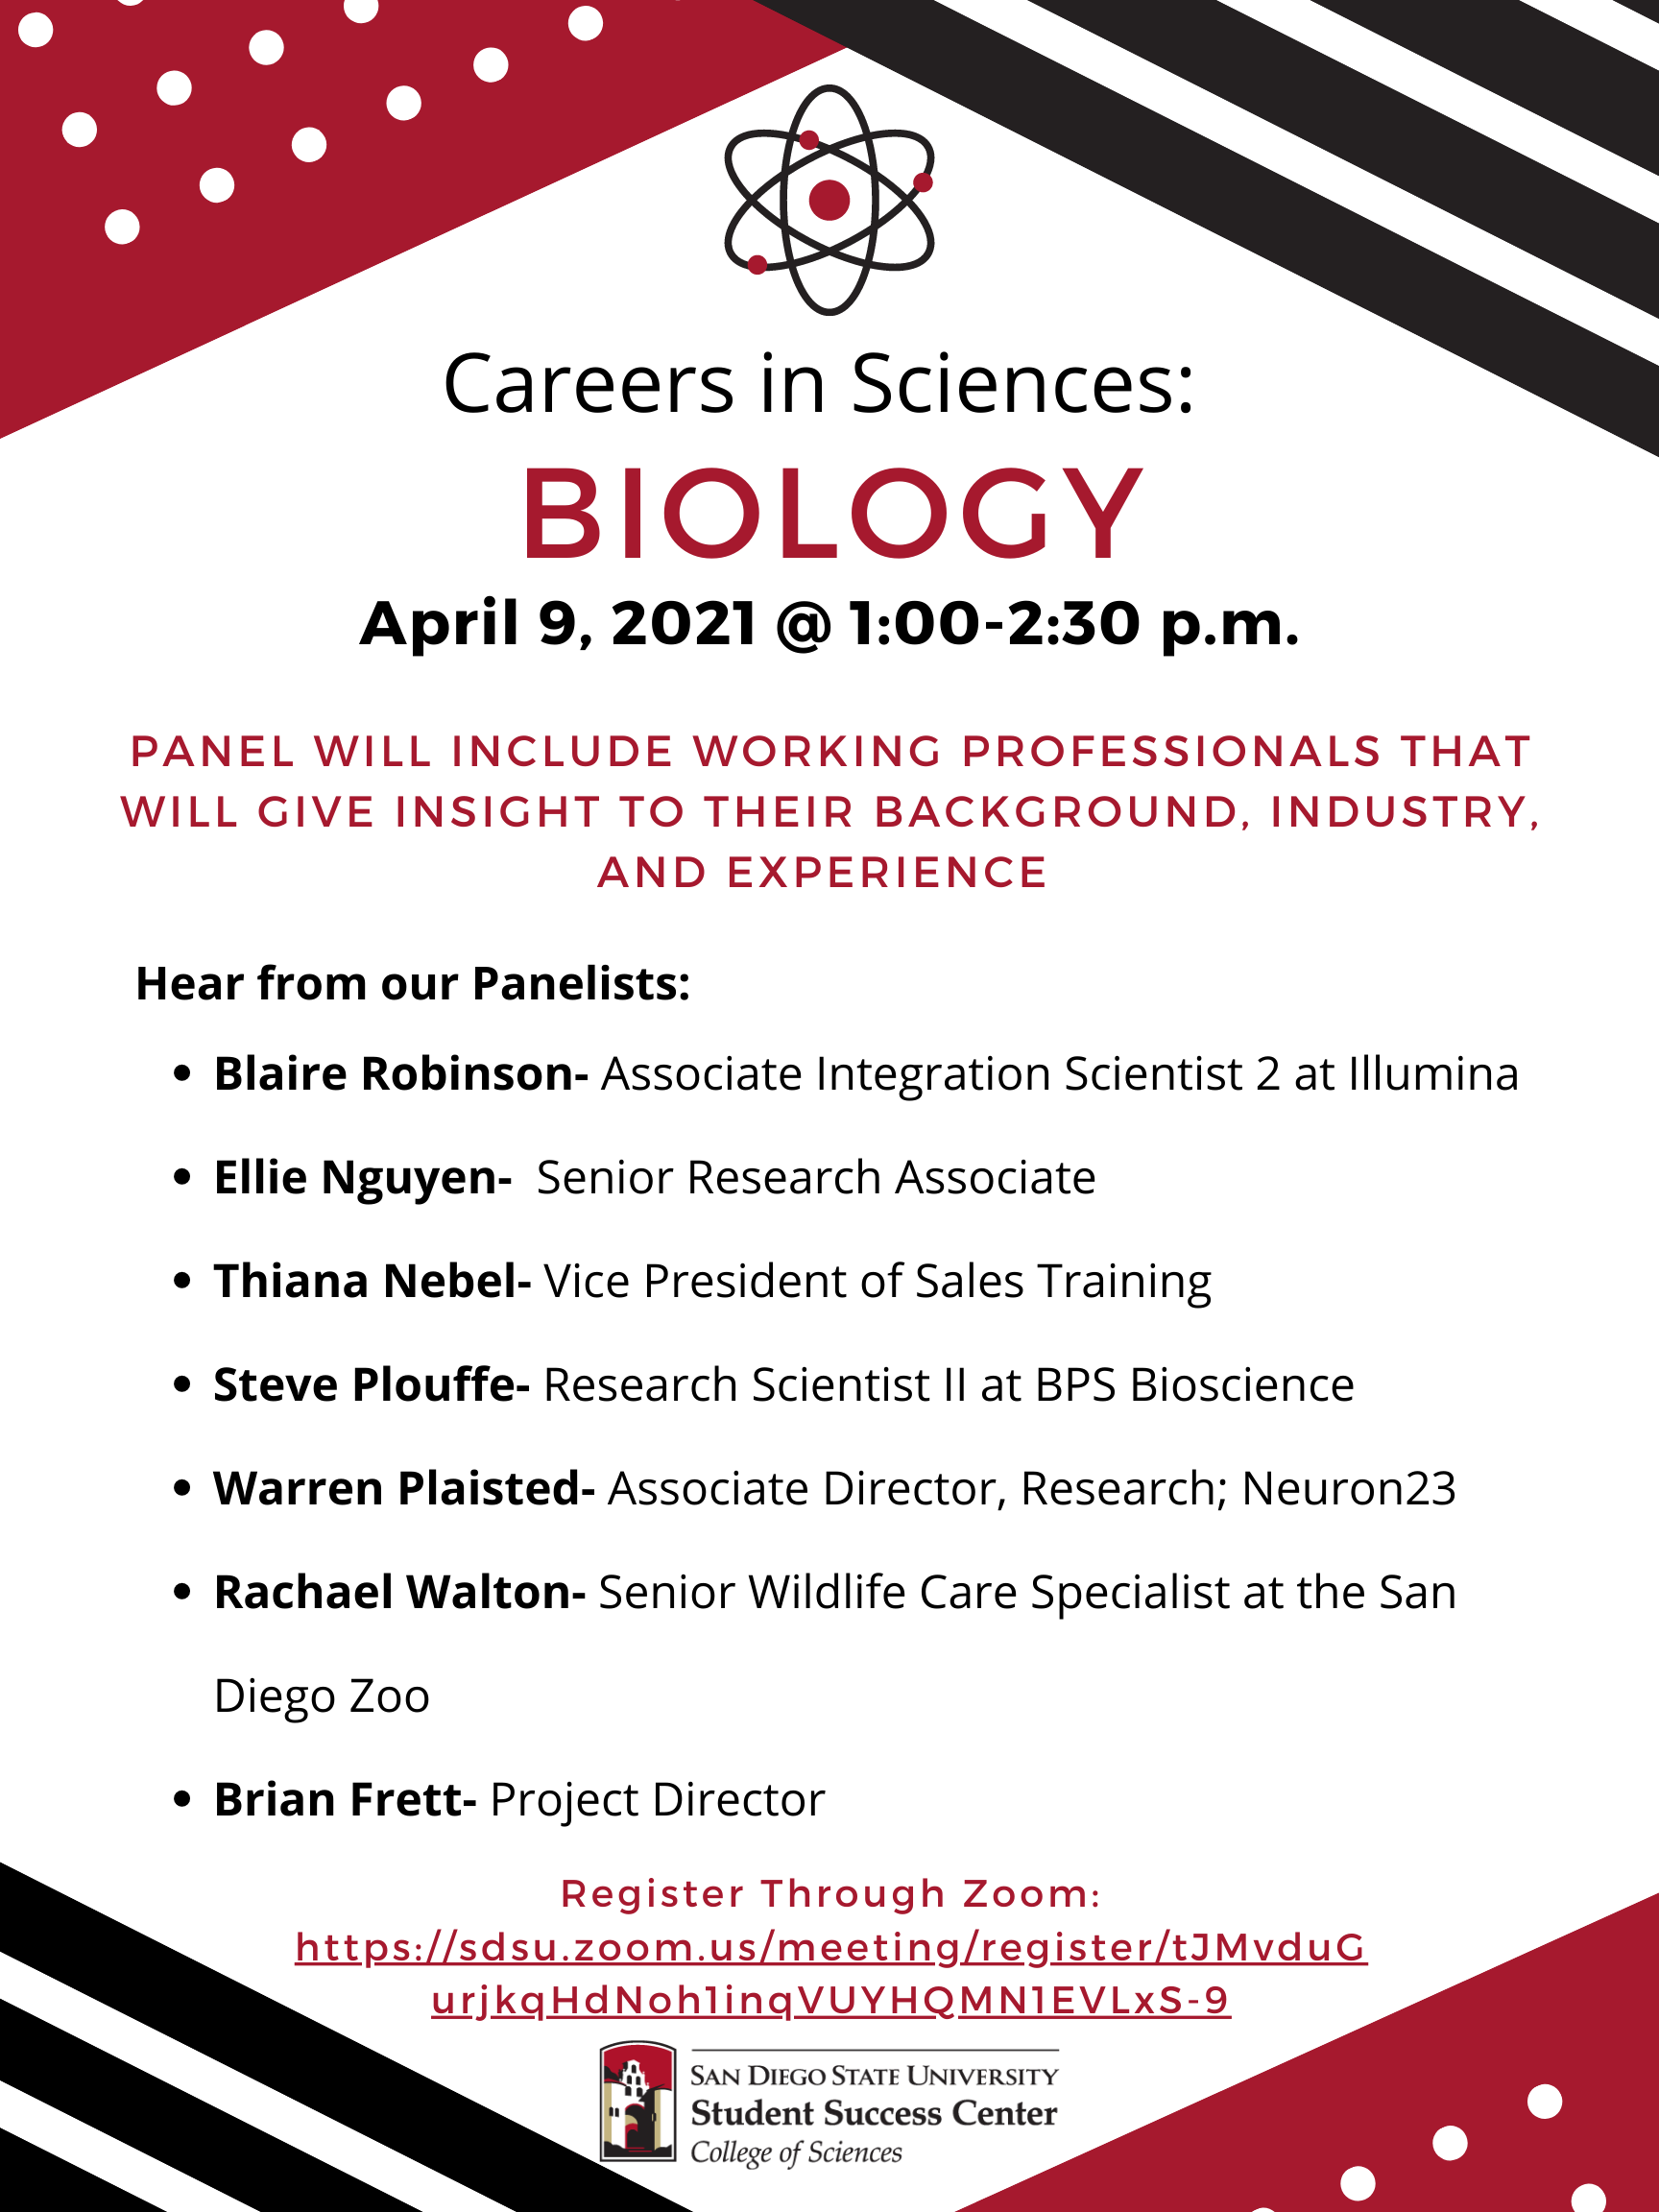 Biology Career Panel Flyer with Panelists names